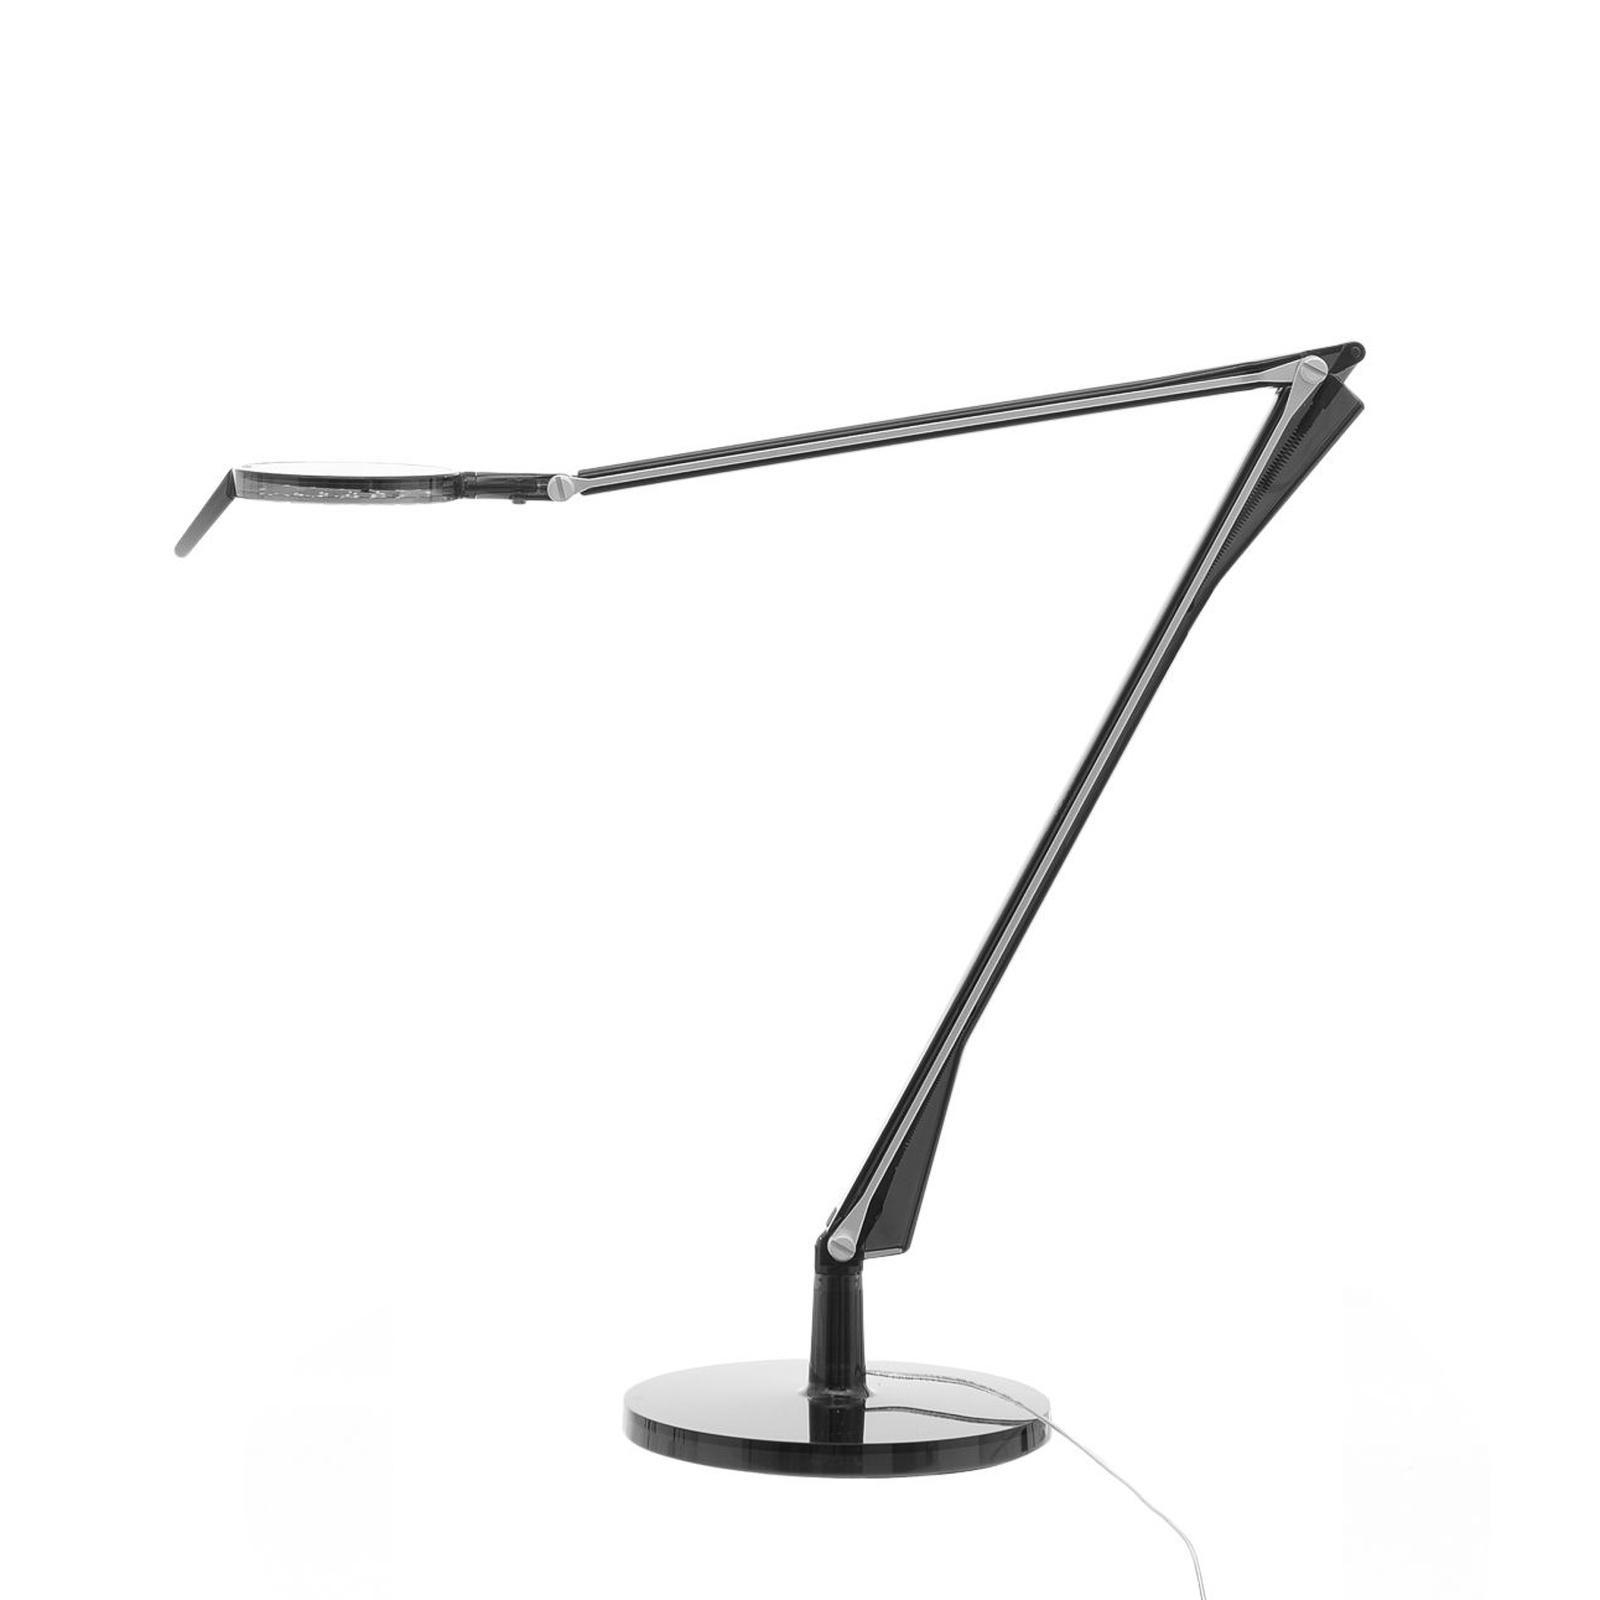 Kartell Aledin Tec LED-Tischleuchte, rauchgrau